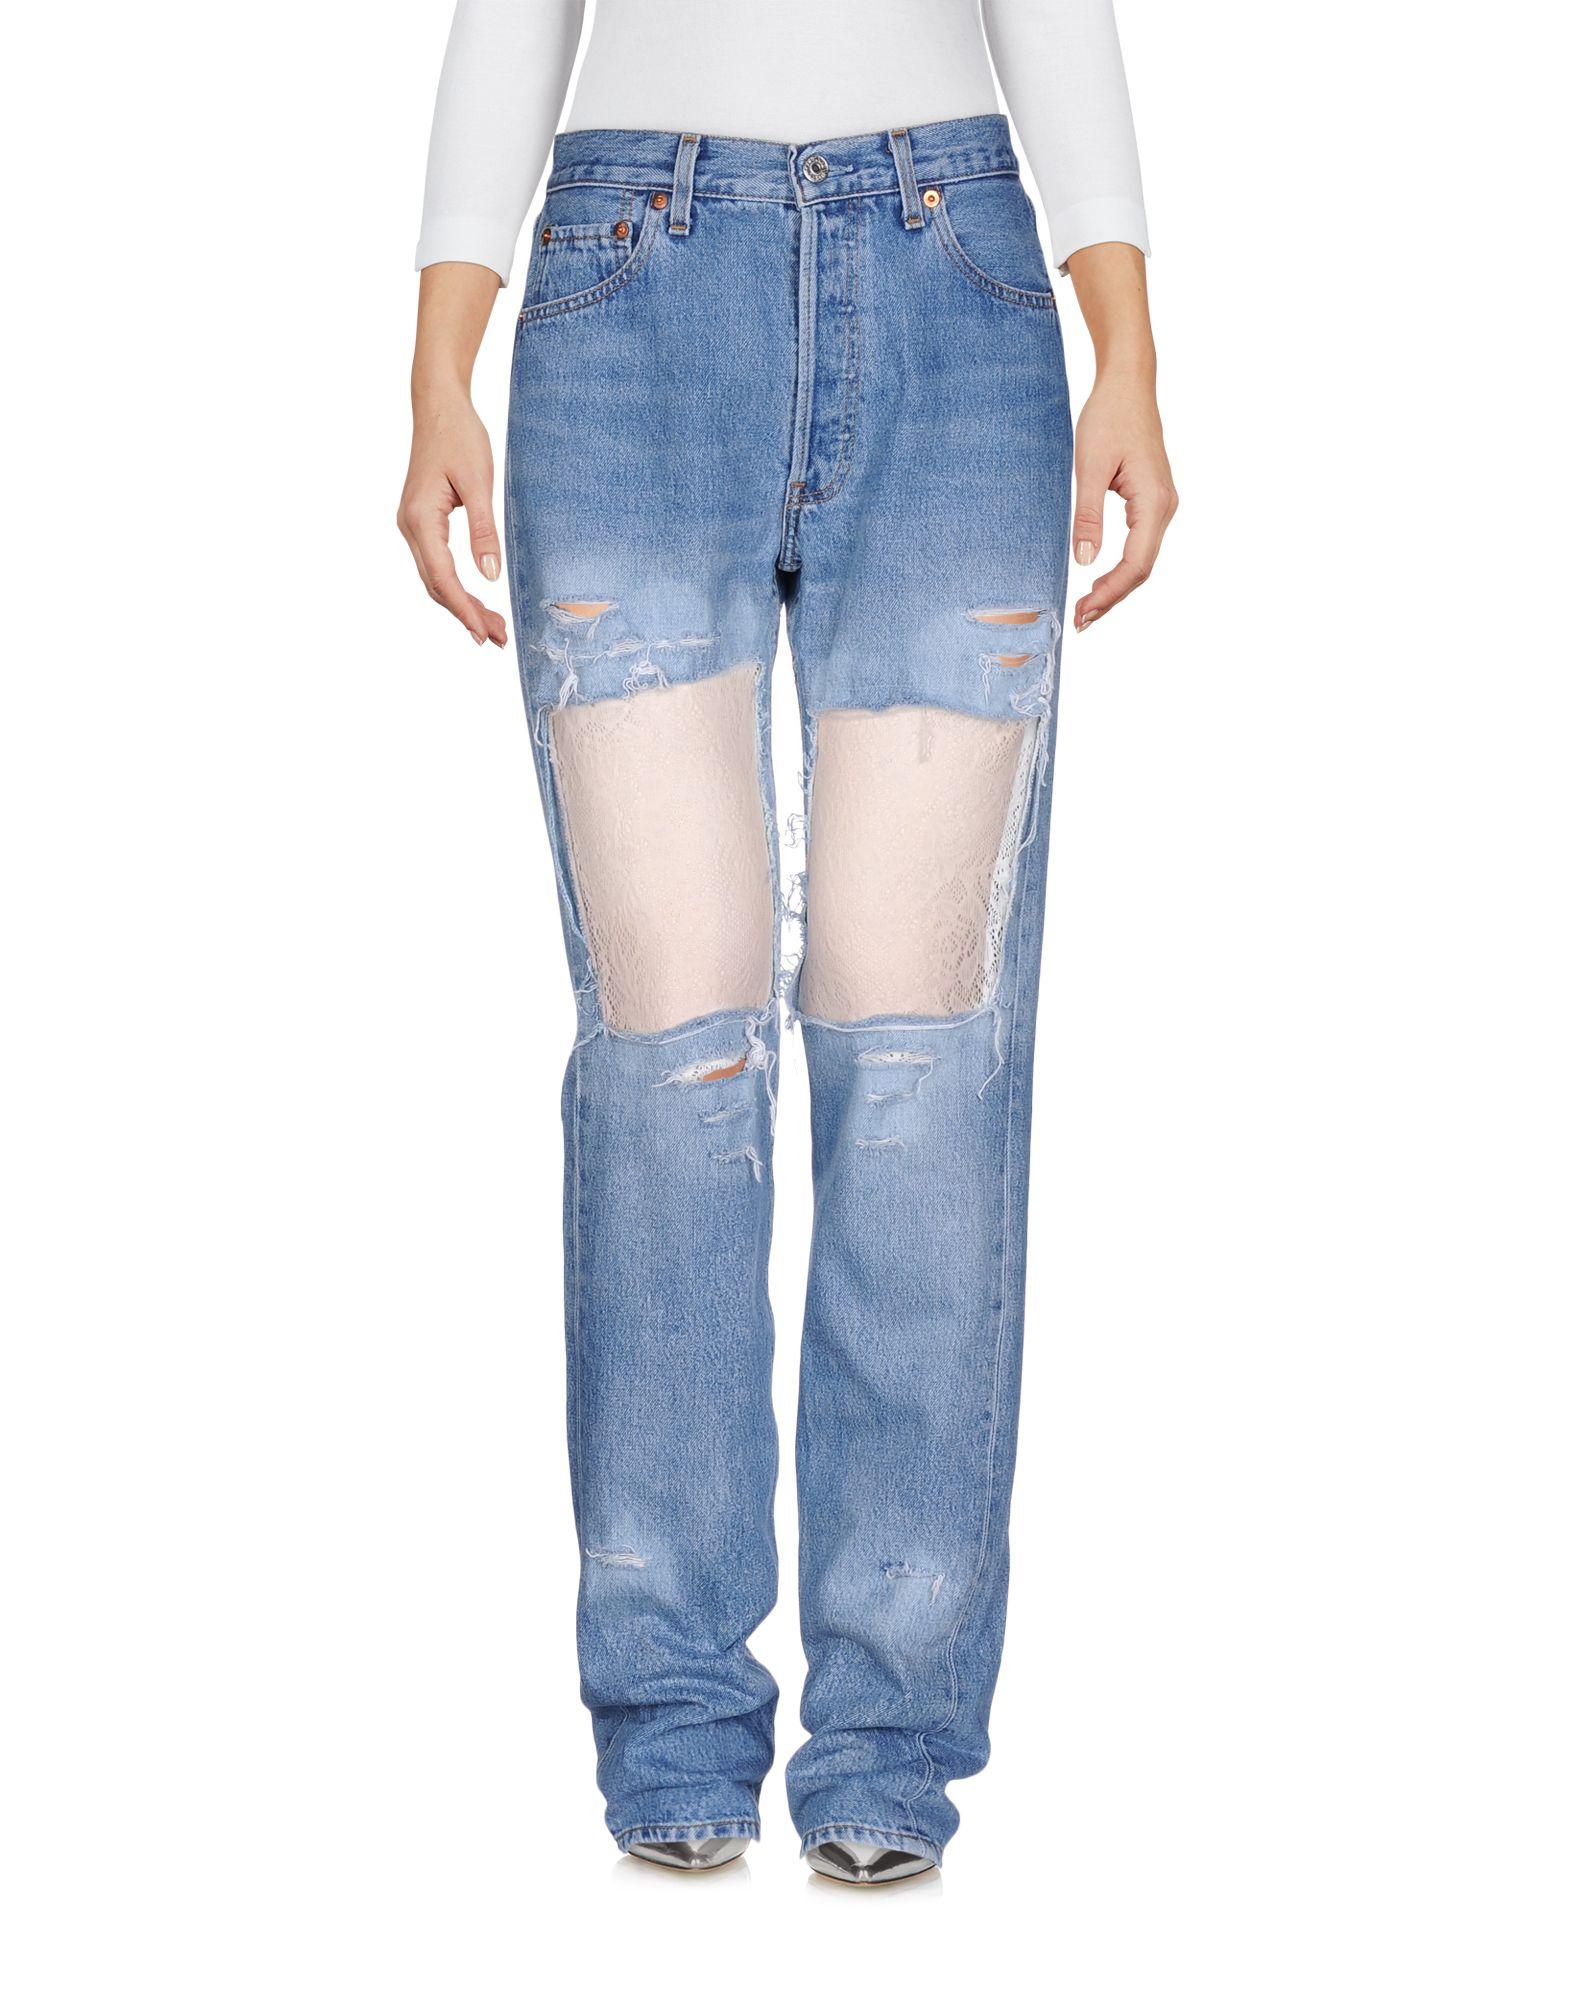 ФОТО forte dei marmi couture Джинсовые брюки